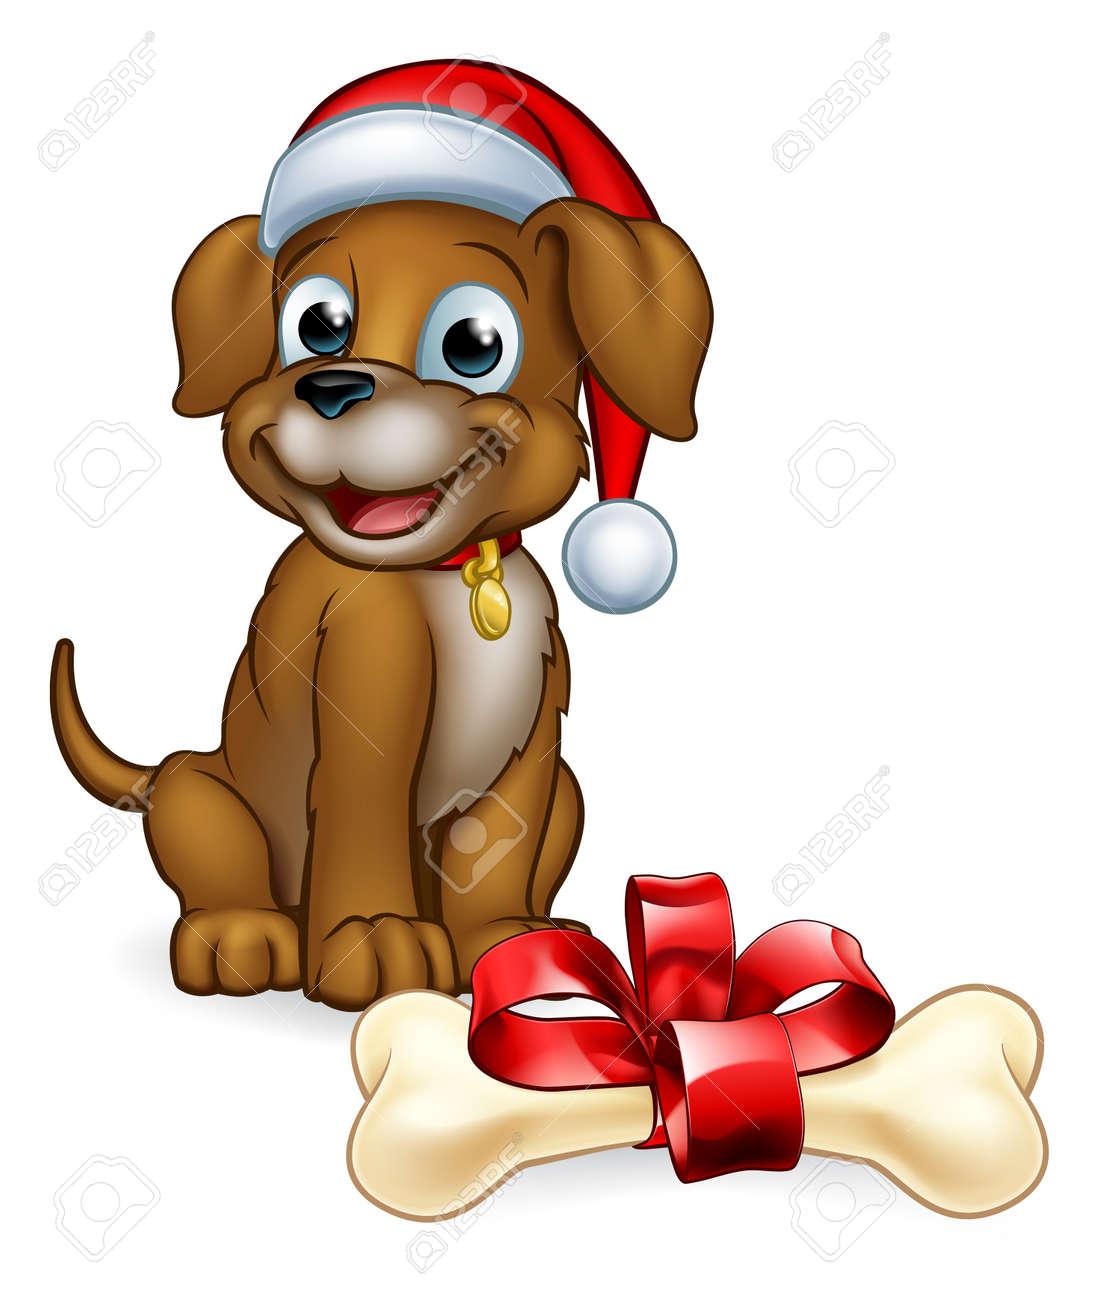 A Pet Dog In A Christmas Santa Claus Hat Cute Cartoon Character Royalty Free Cliparts Vectors And Stock Illustration Image 112347241